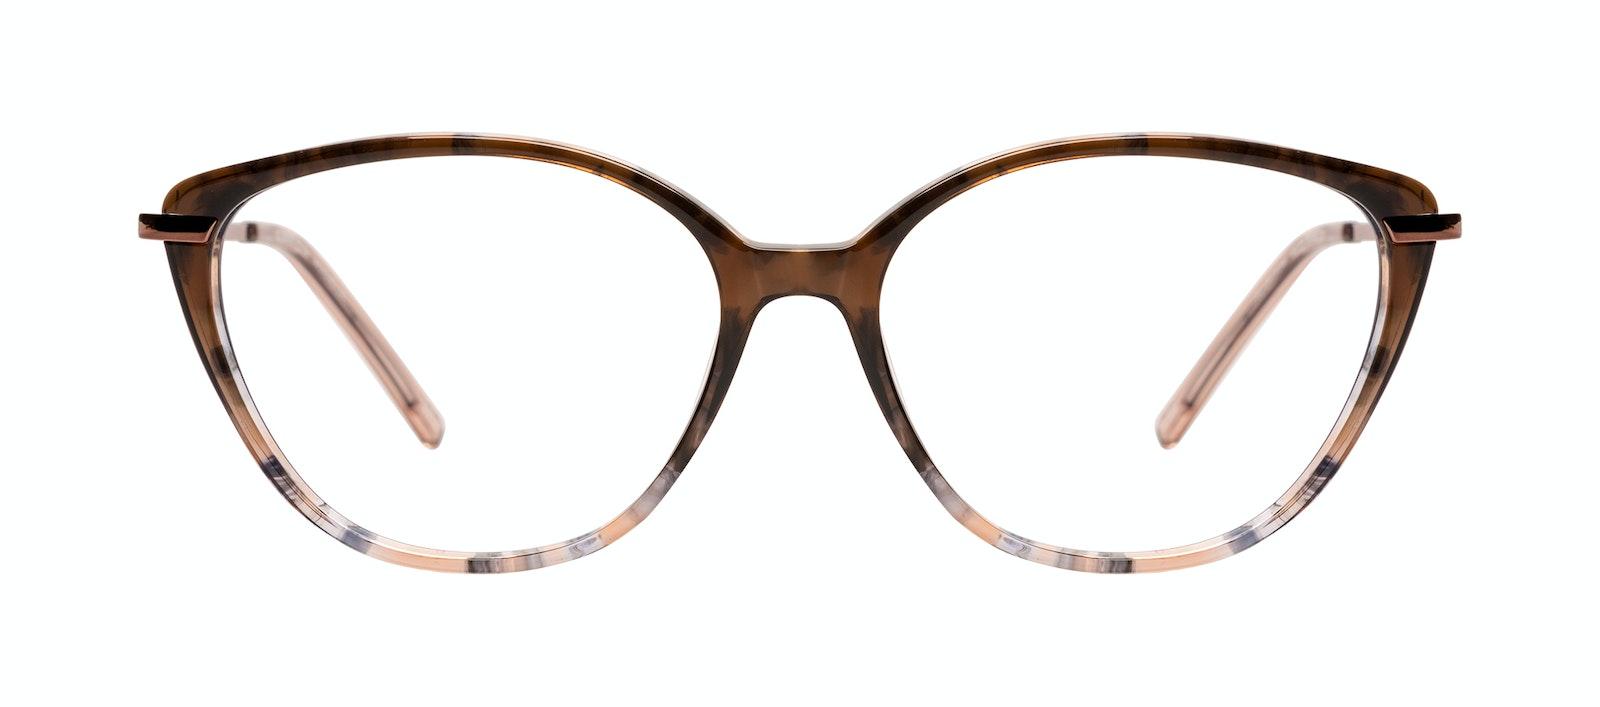 Affordable Fashion Glasses Eyeglasses Women Illusion Plus Moondust Front